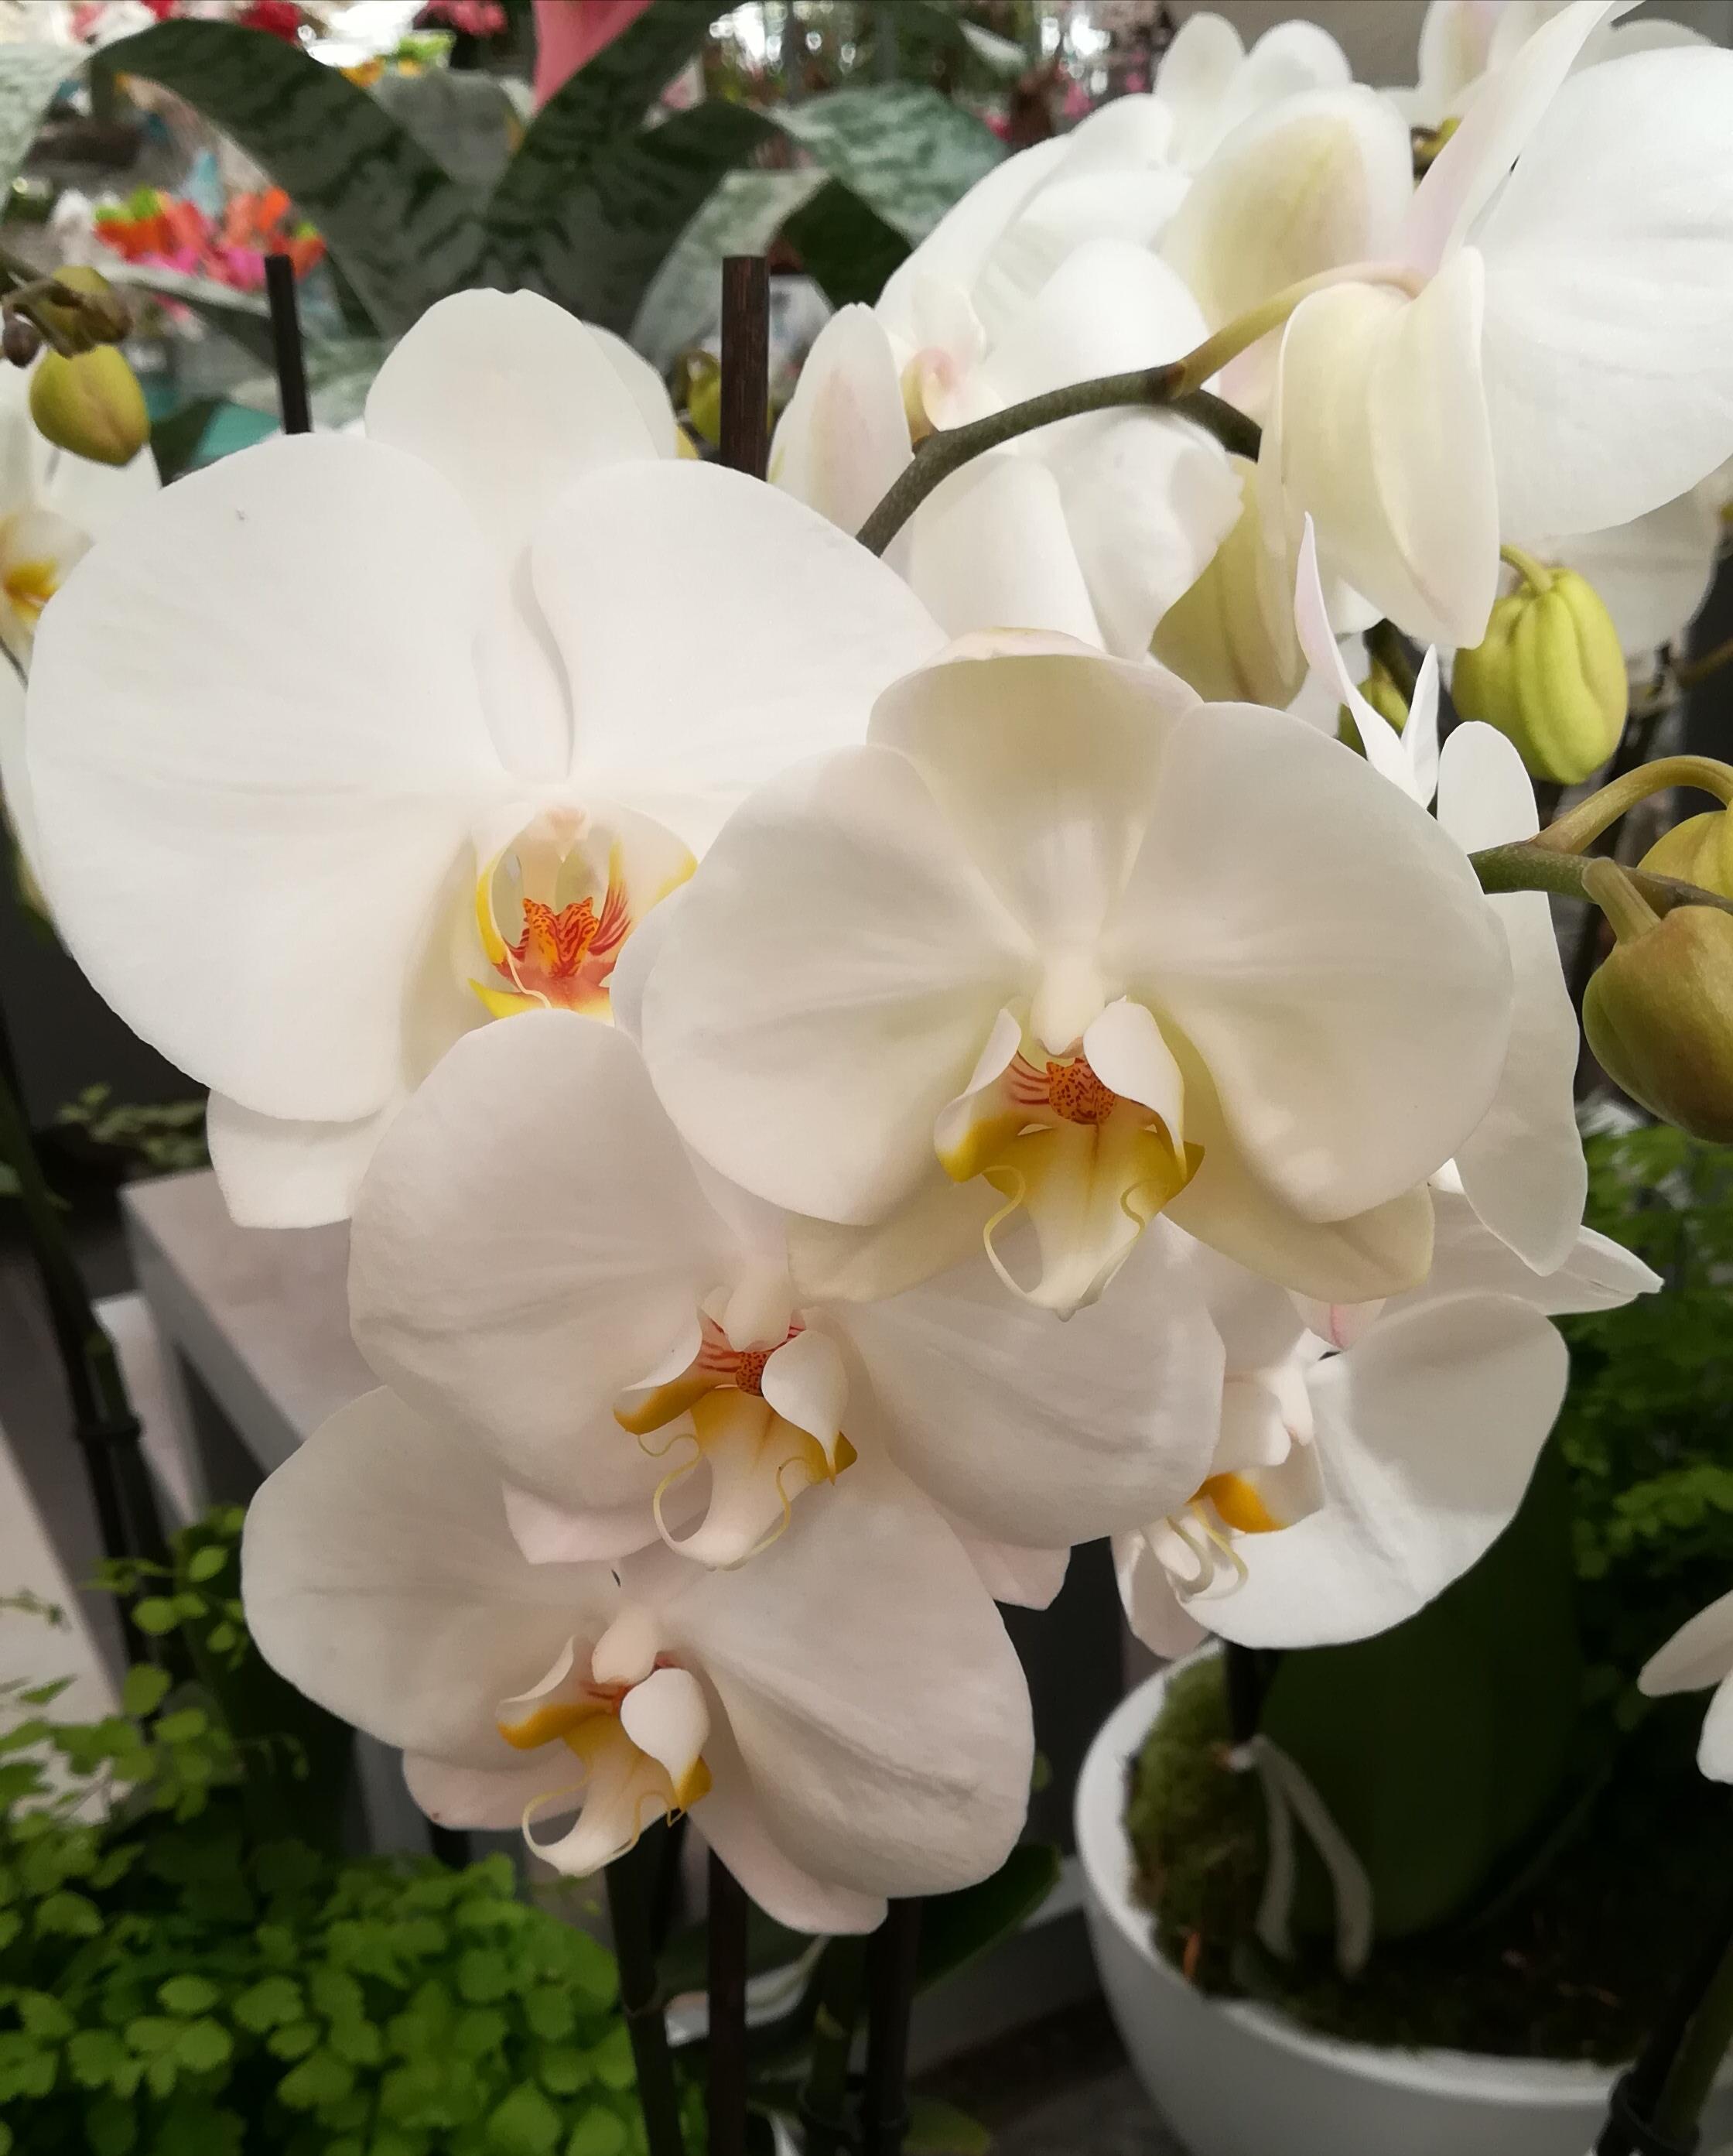 100x170-fleur-blanche-orchidee-mariage-LDM-Createur-fr